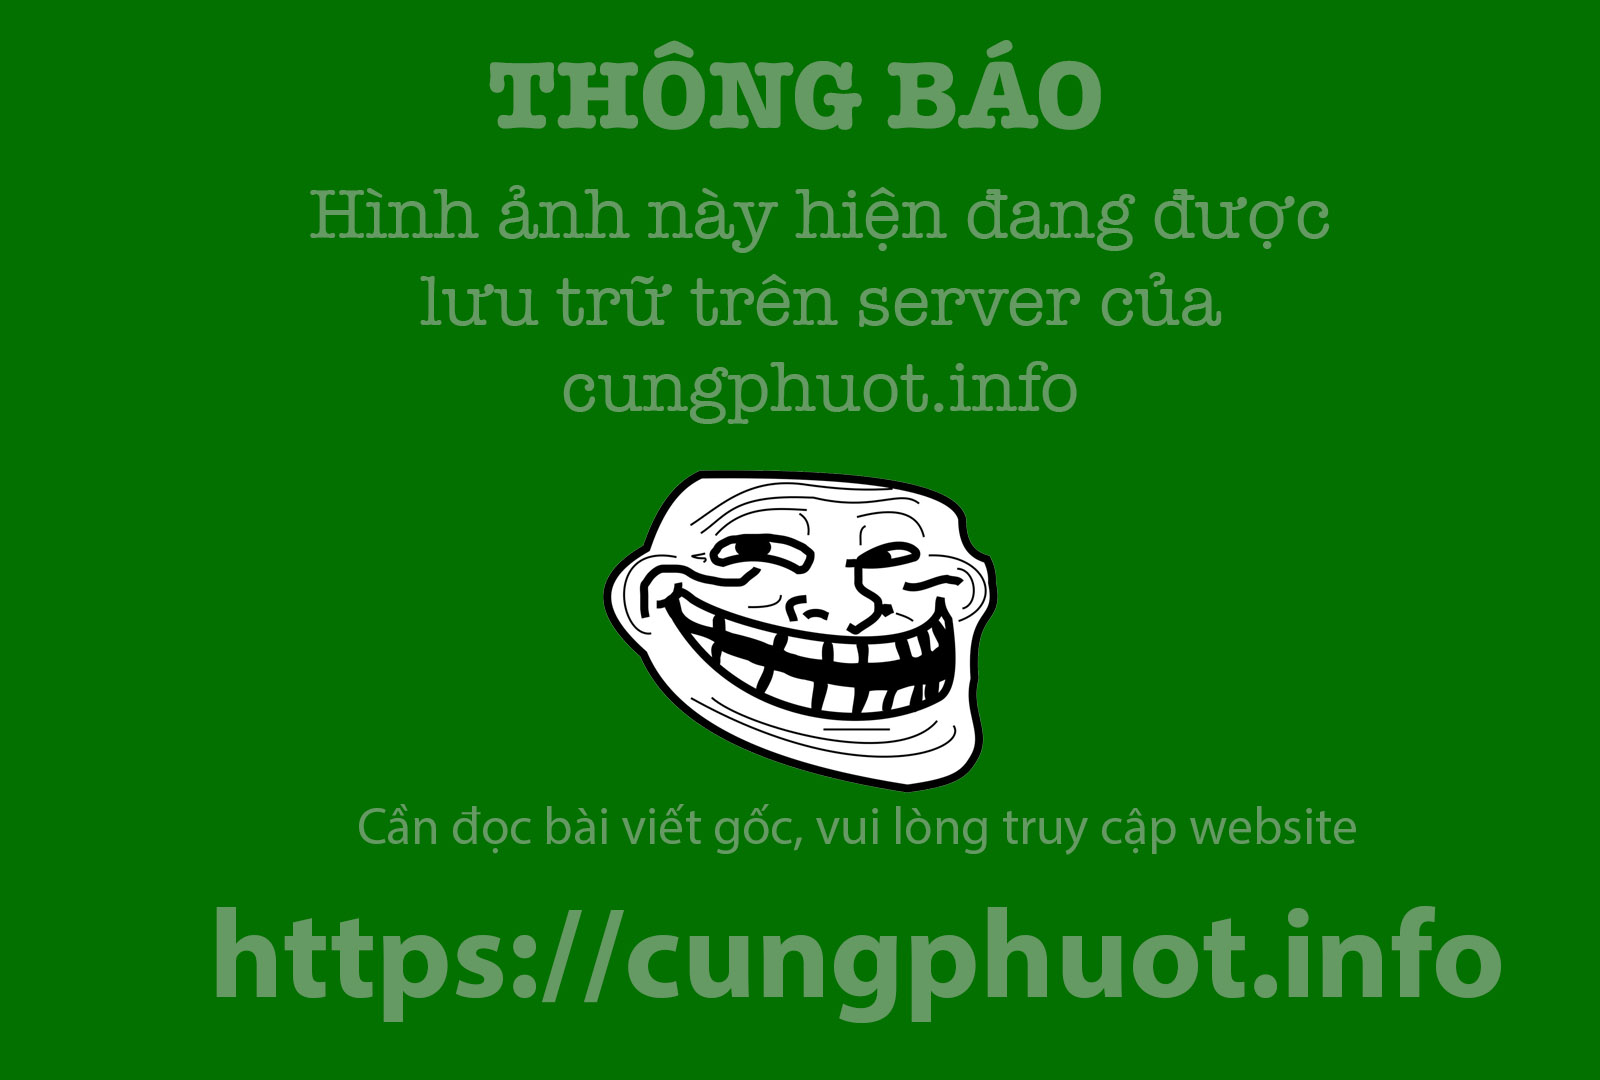 Binh minh tuyet dep tren nhung doi che Tan Cuong hinh anh 14